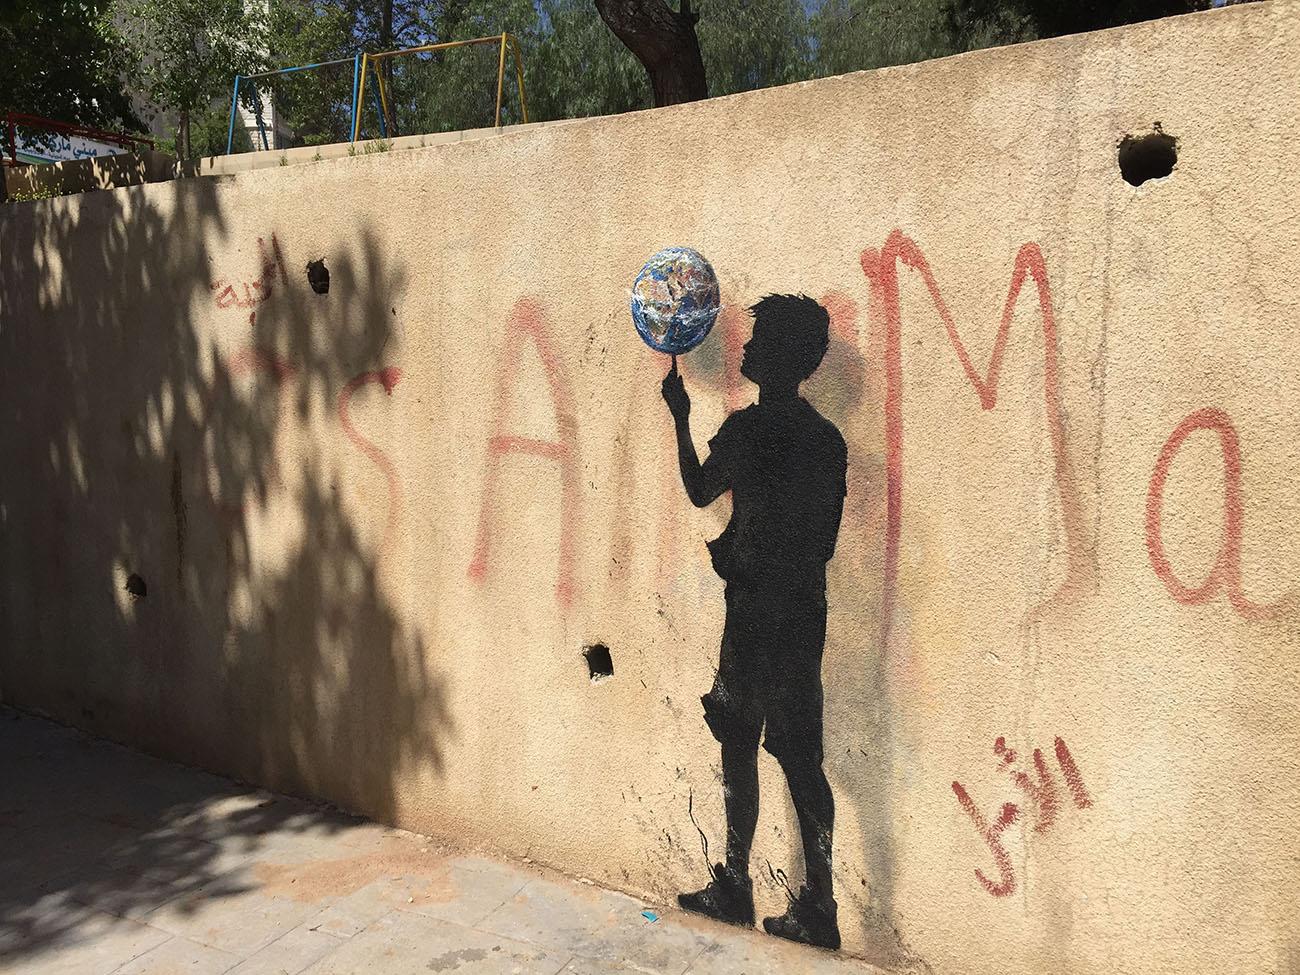 pejac-social-arte-graffiti-de-rua-8